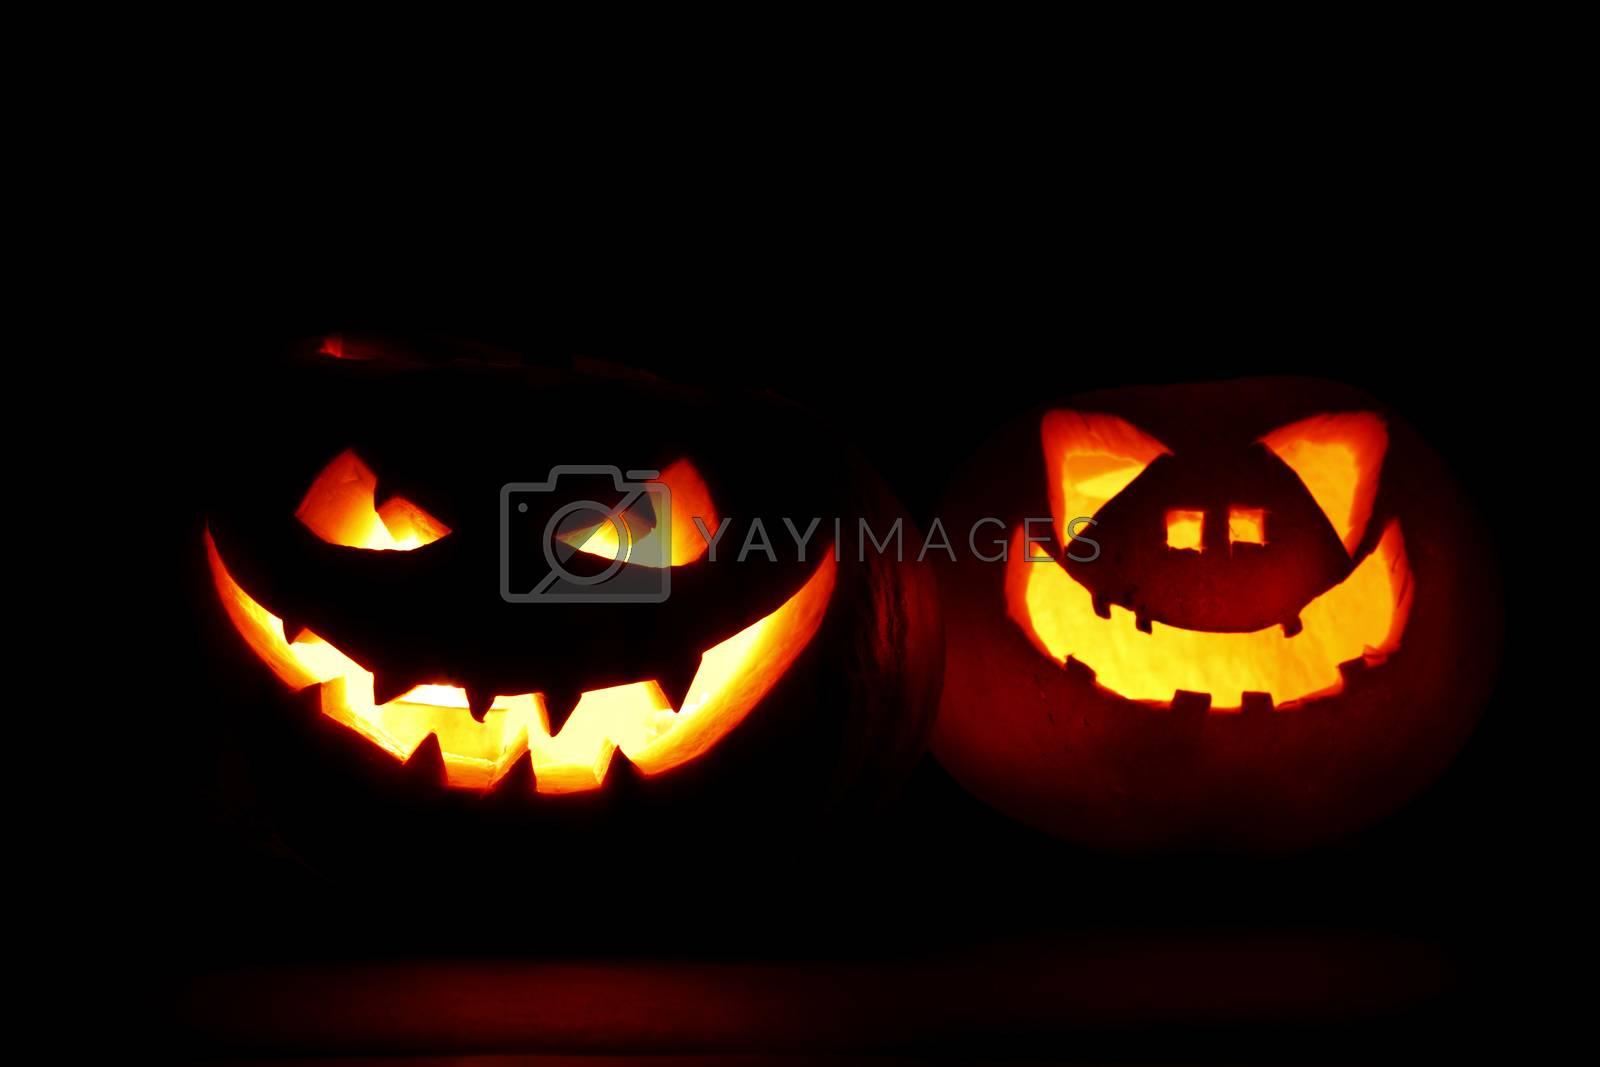 Two carved Halloween pumpkins jack-o-lantern on dark background